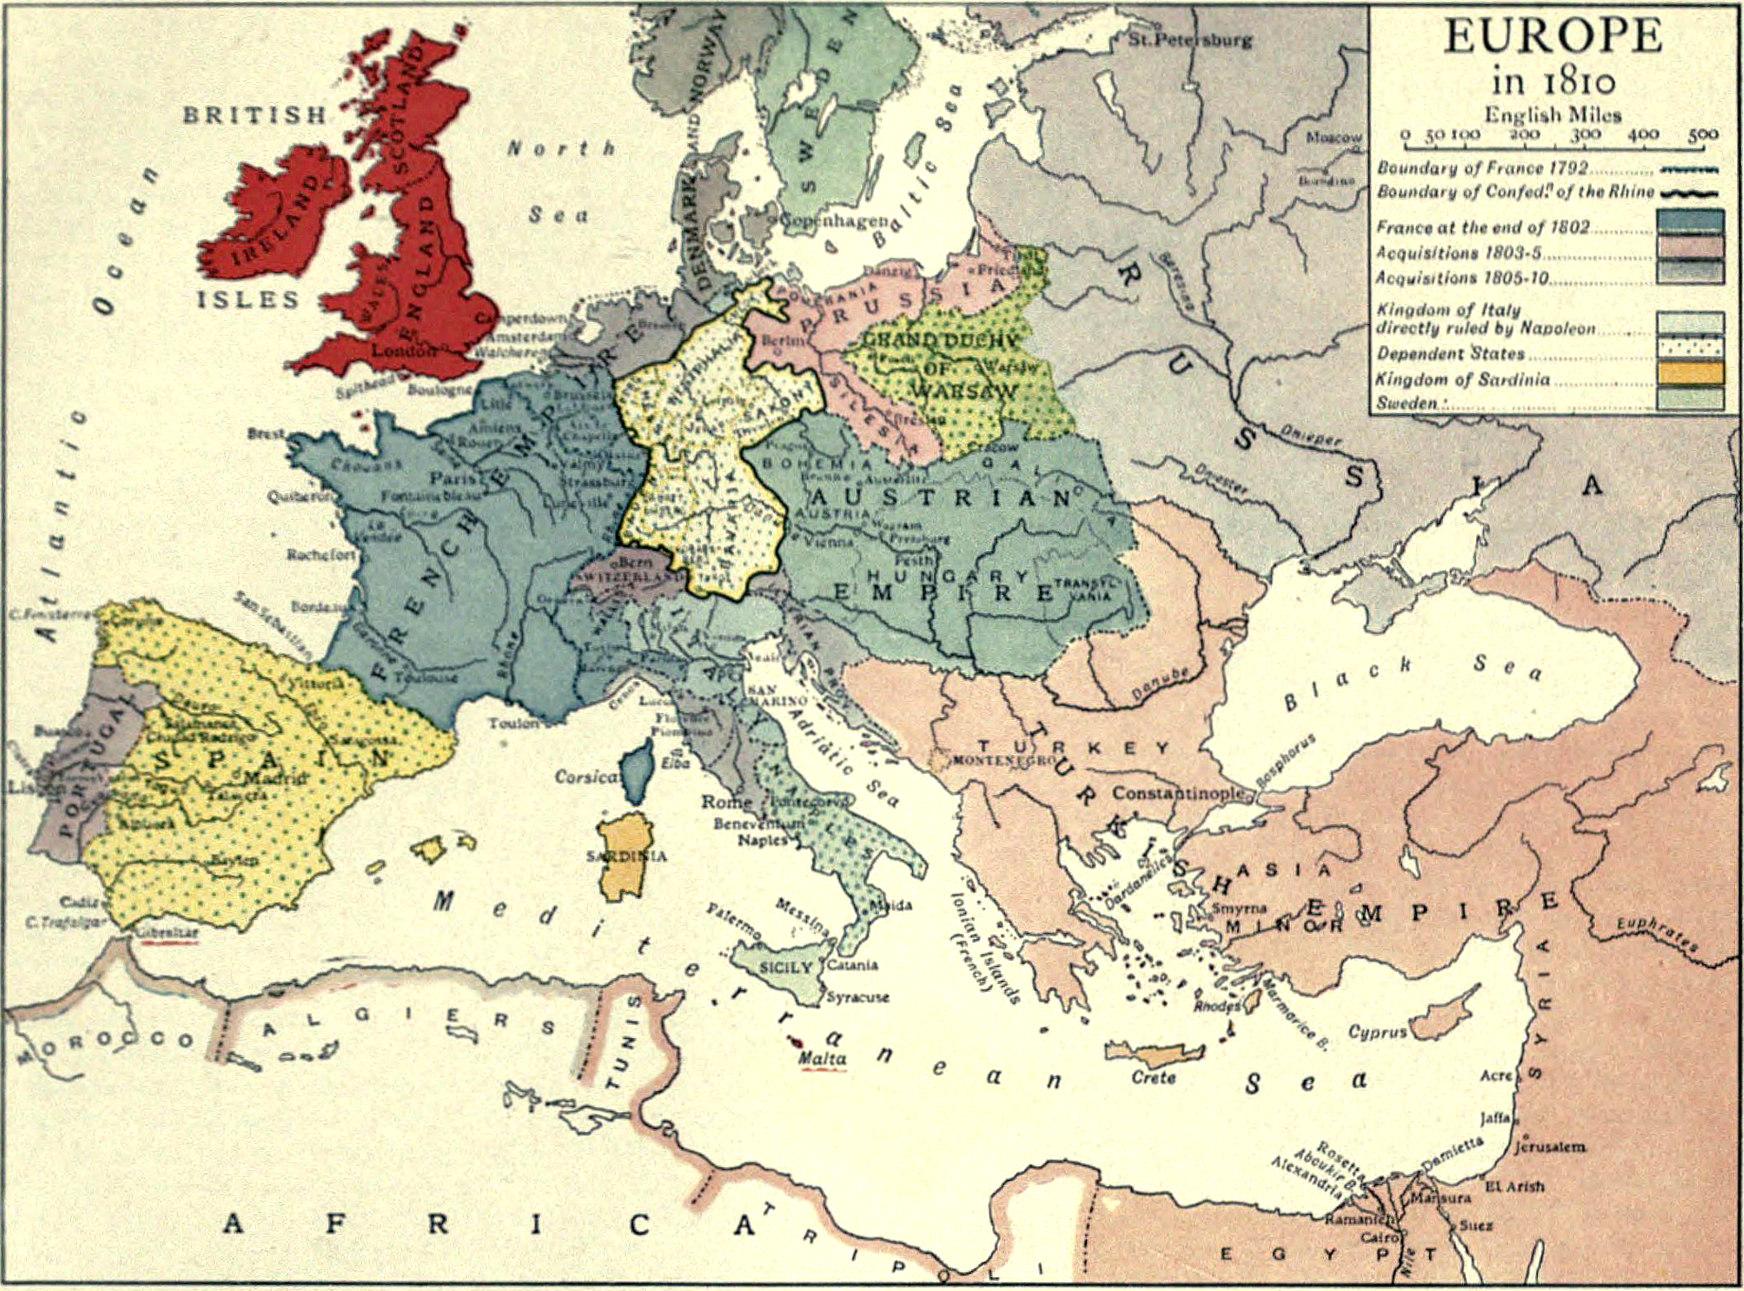 File Eb1911 Europe 1810 Jpg Wikimedia Commons